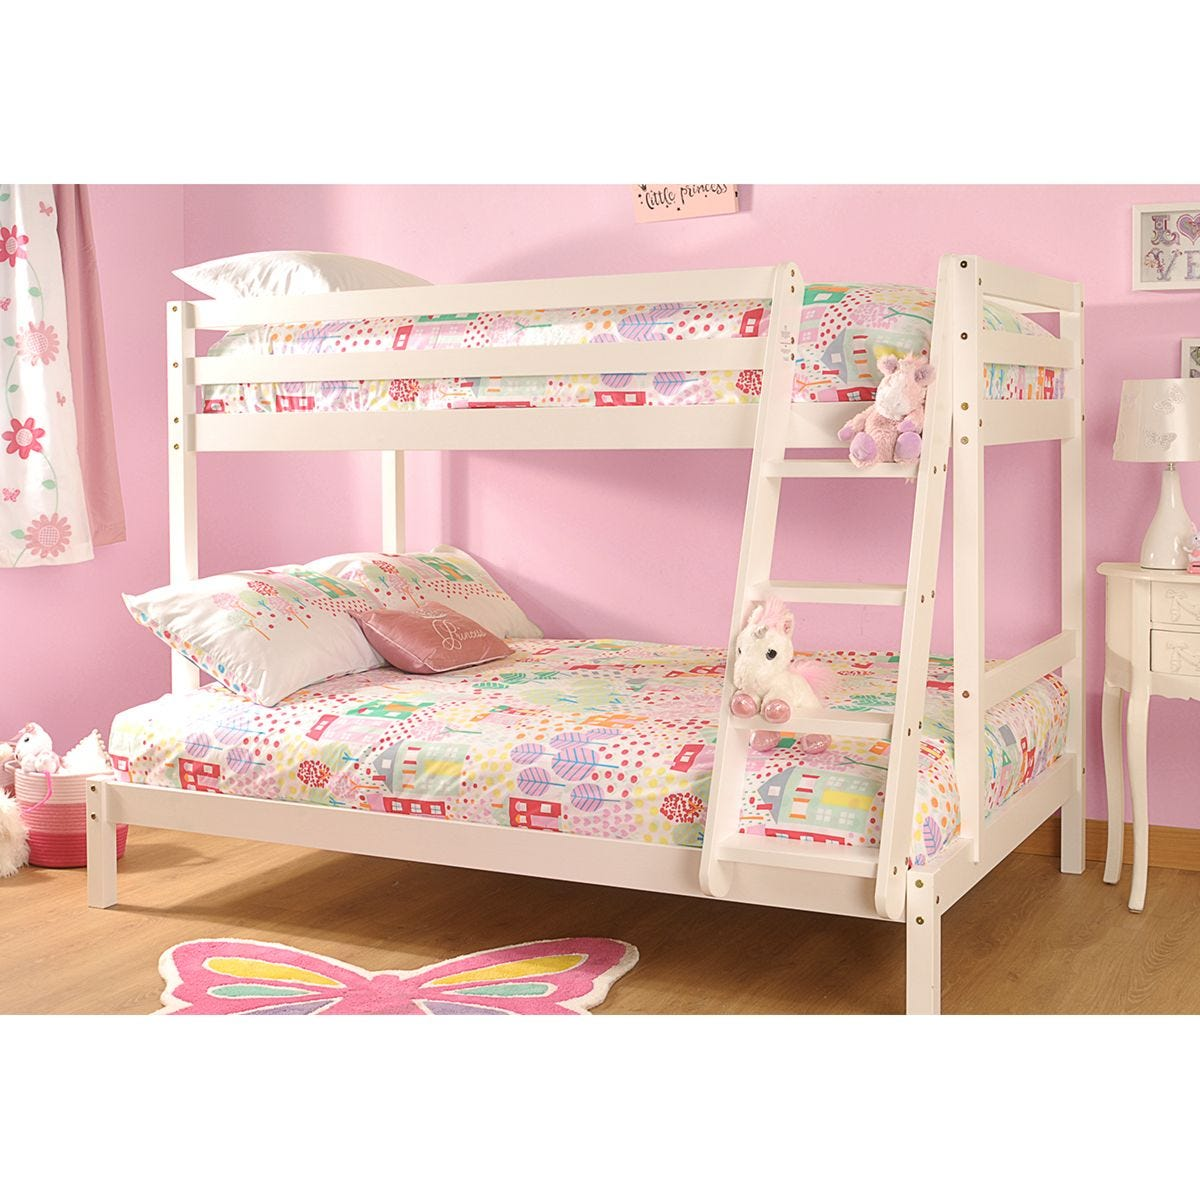 Bexley Single Triple Bunk Bed - White